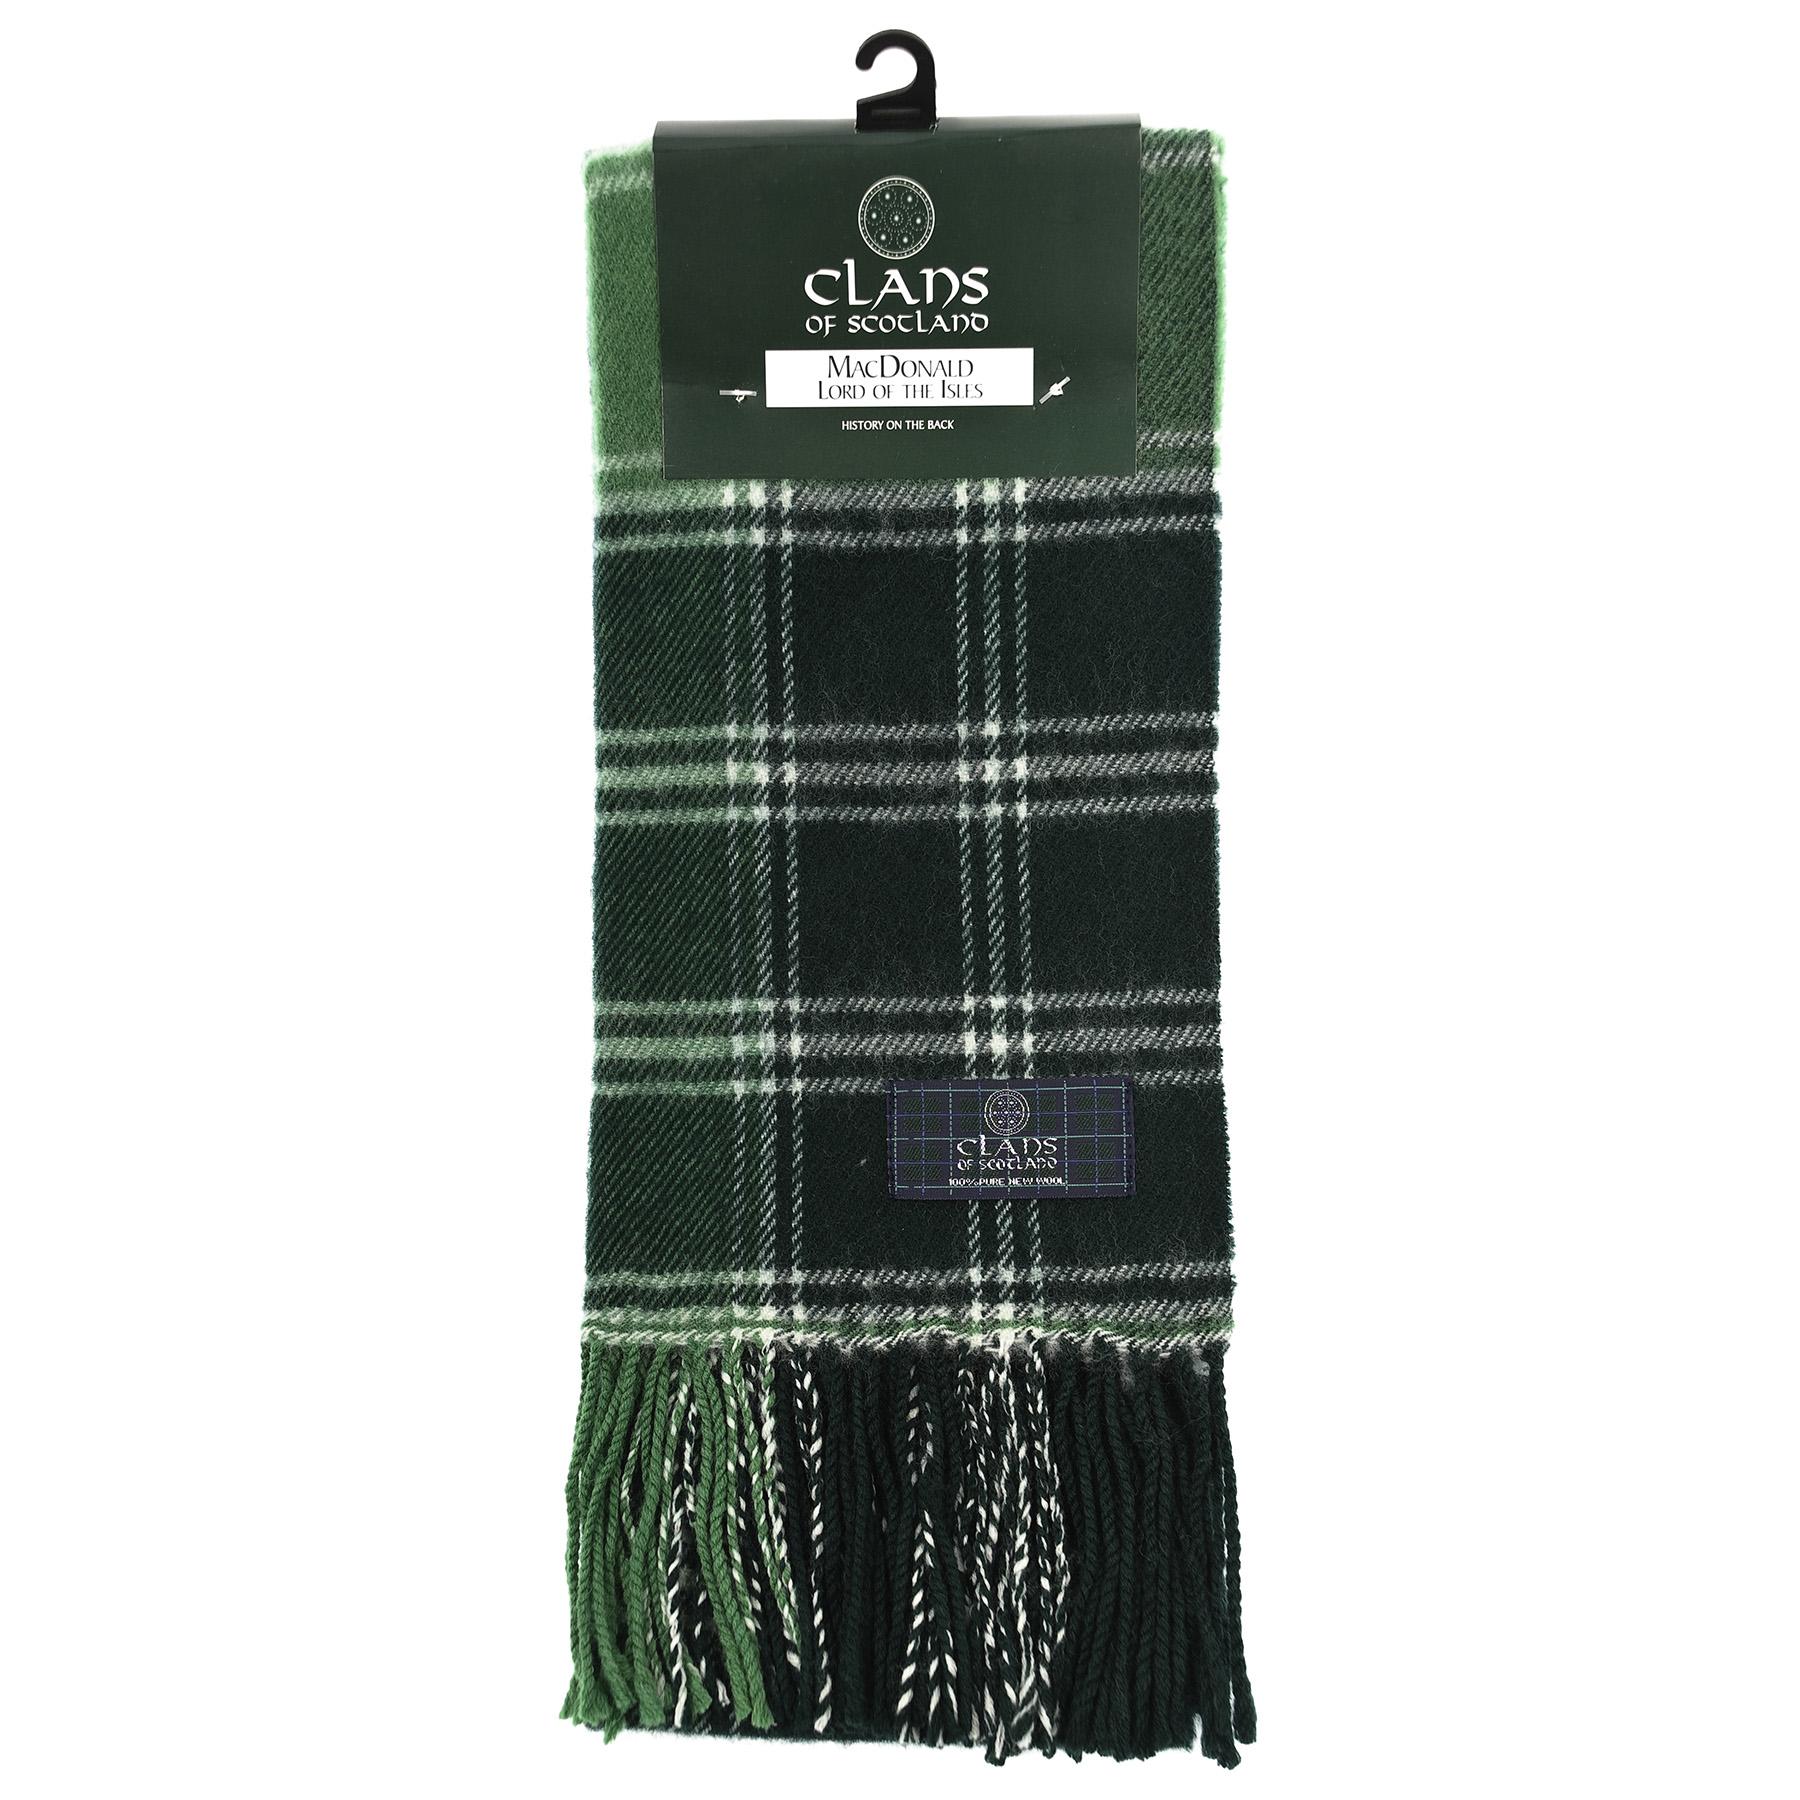 9f8b656e5557 Echarpe tartan laine echarpe noire et blanche femme